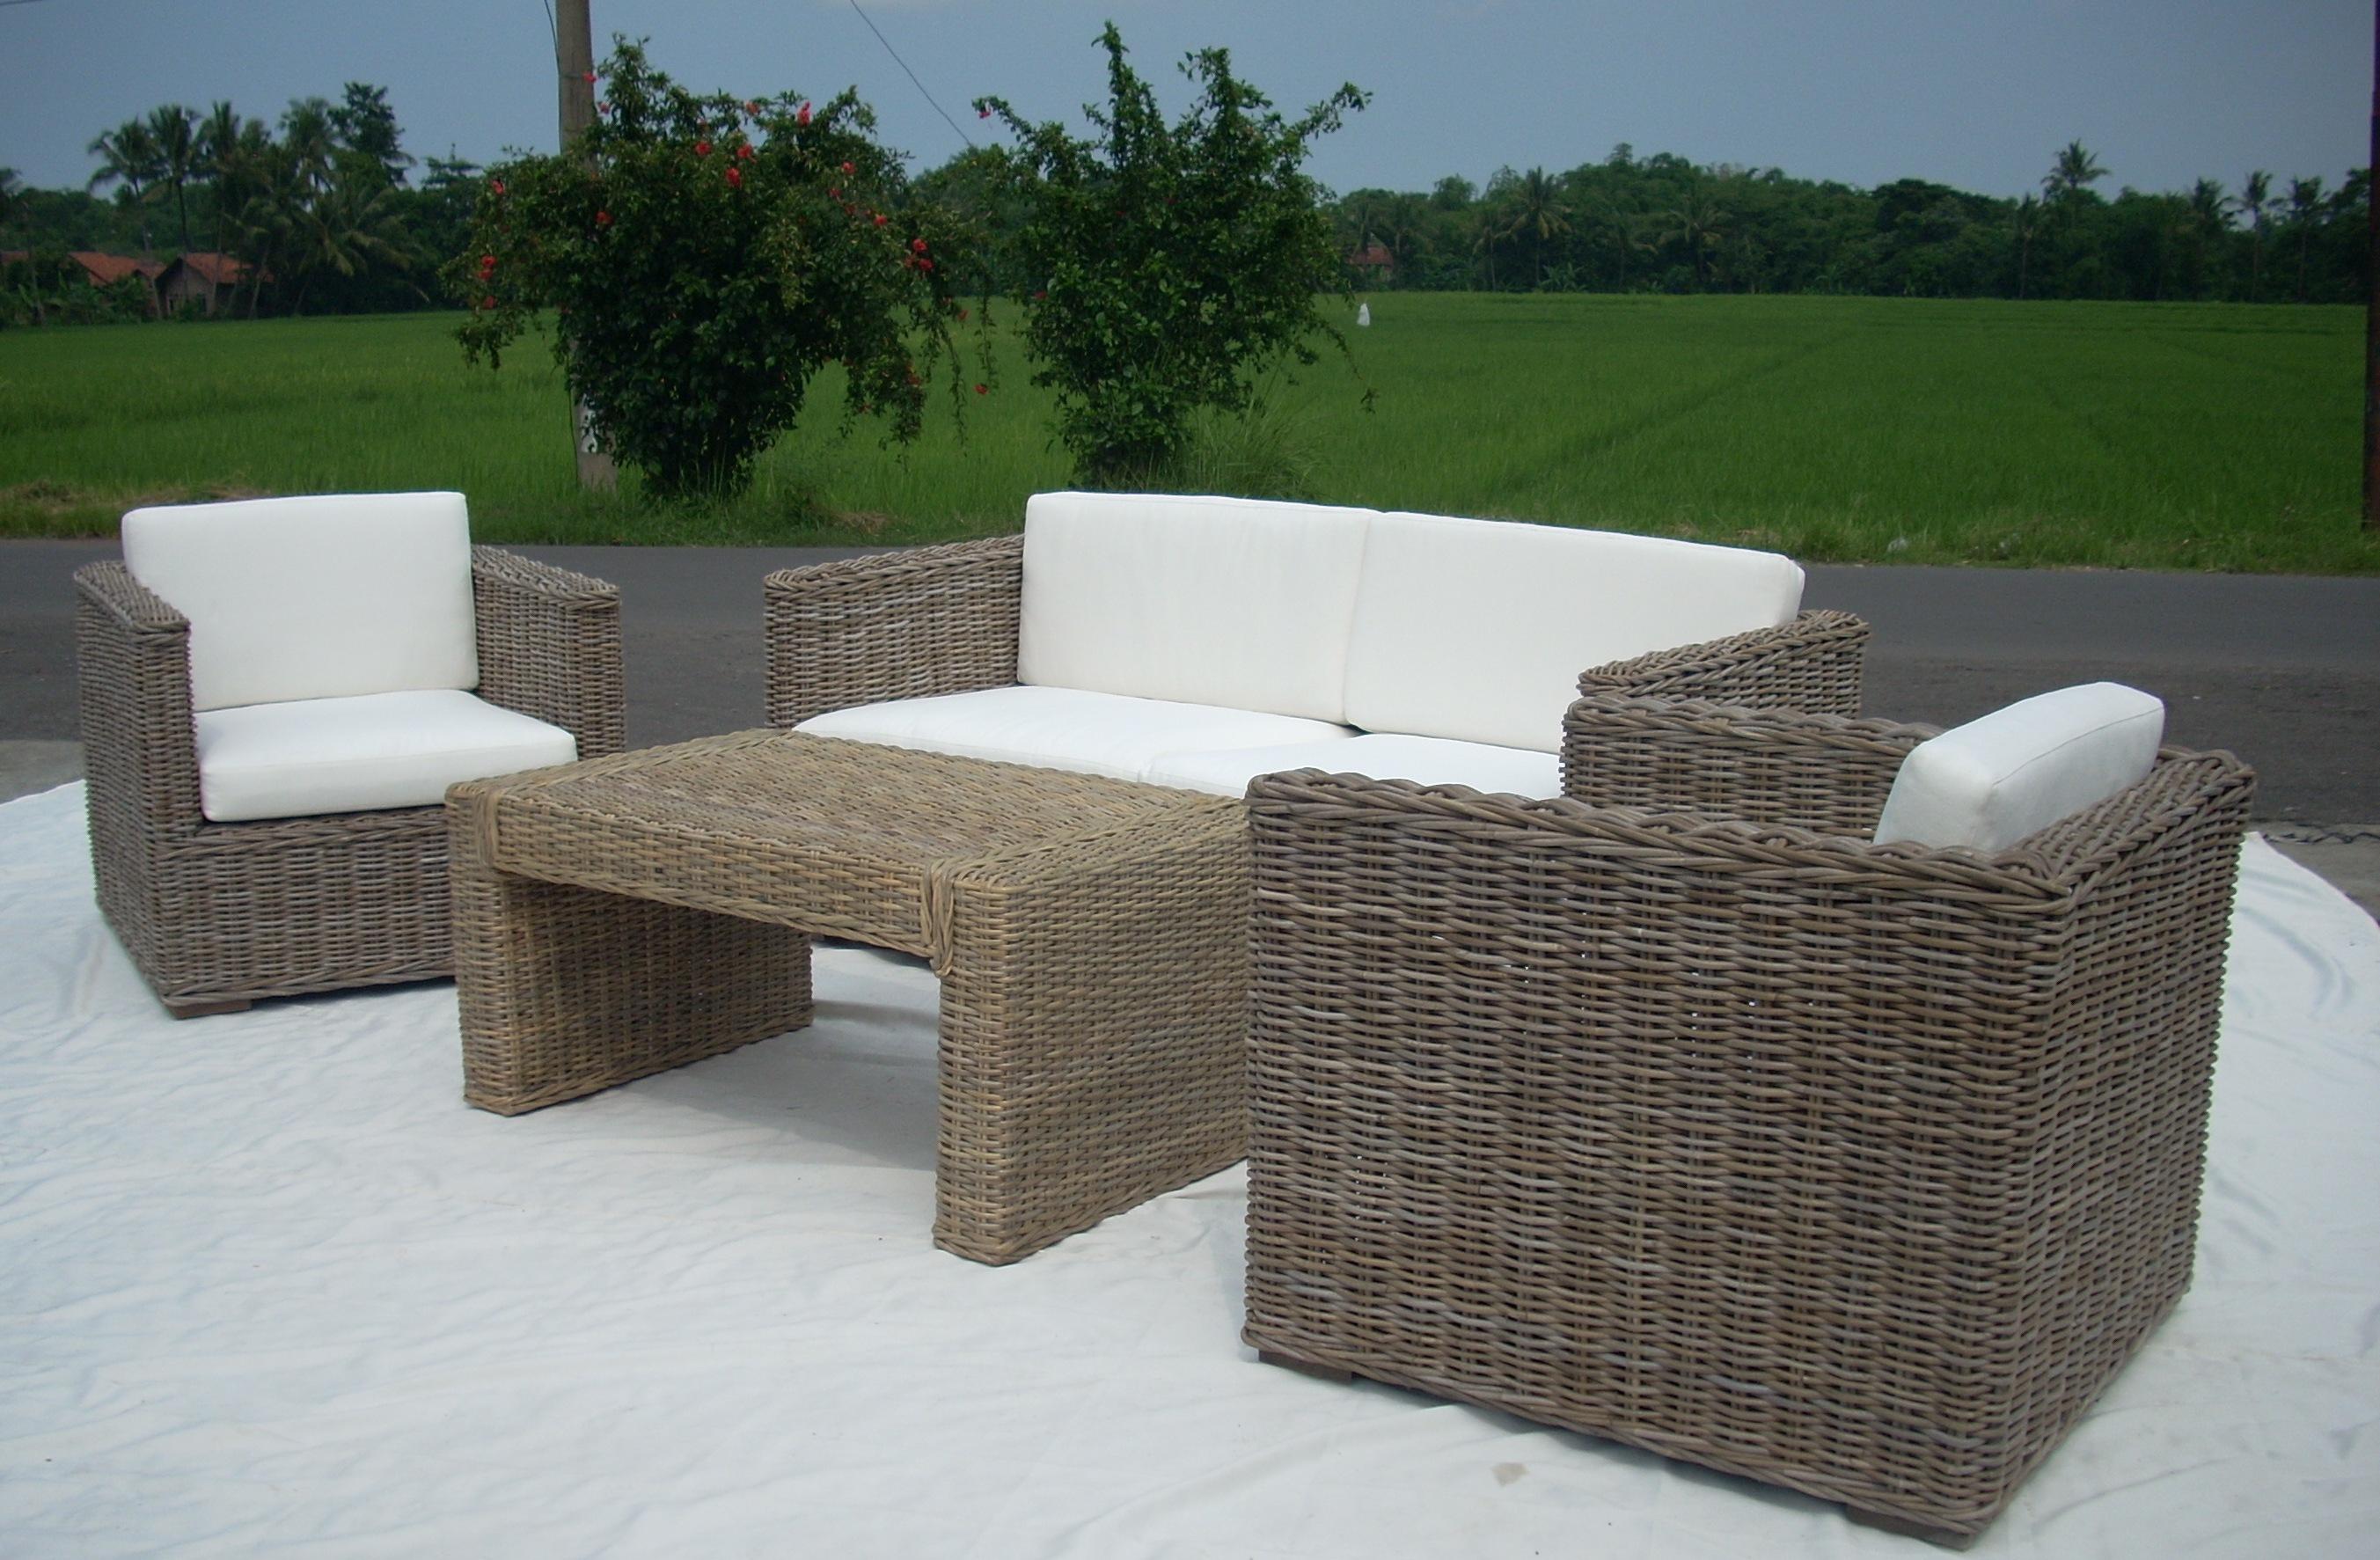 Promo Box Kobo Rattan Set. Rattan Dining   Living Set   Indonesian Rattan Furniture